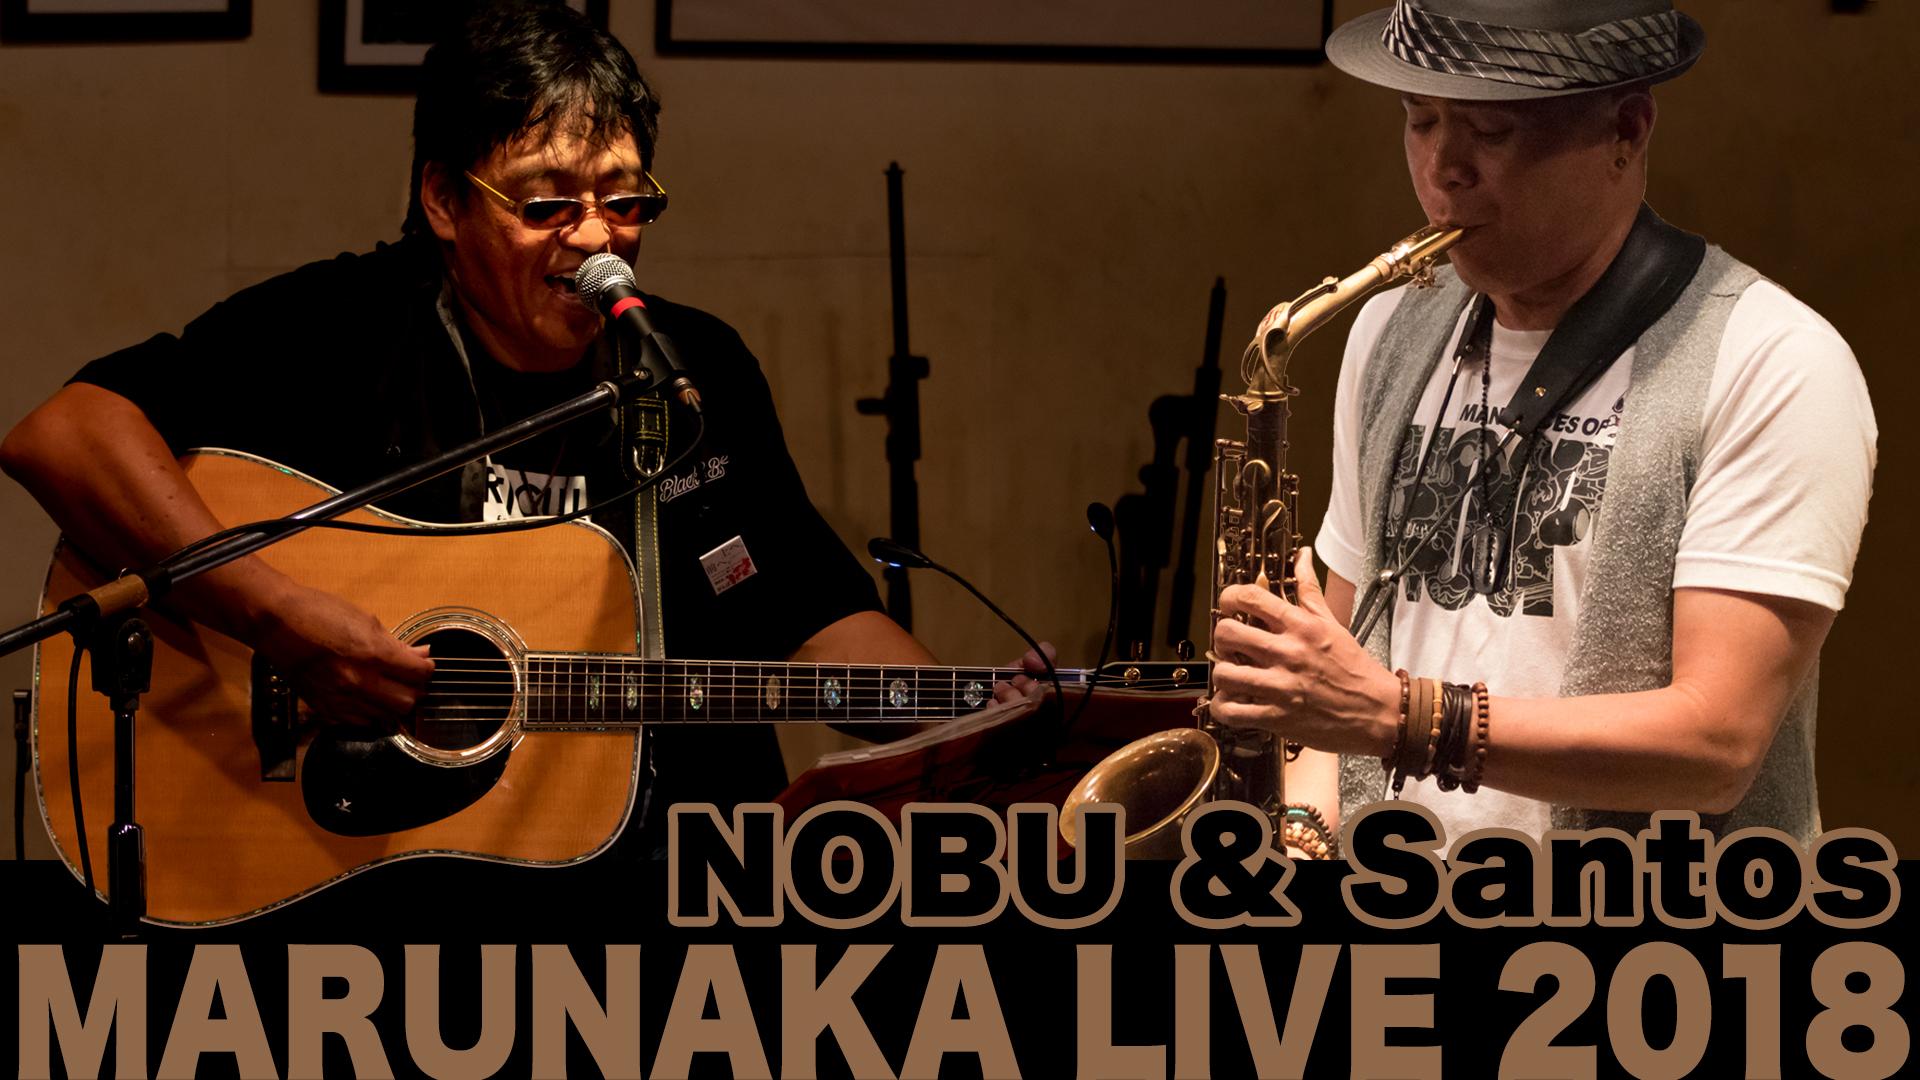 MARUNAKA LIVE2018 Santos & NOBU